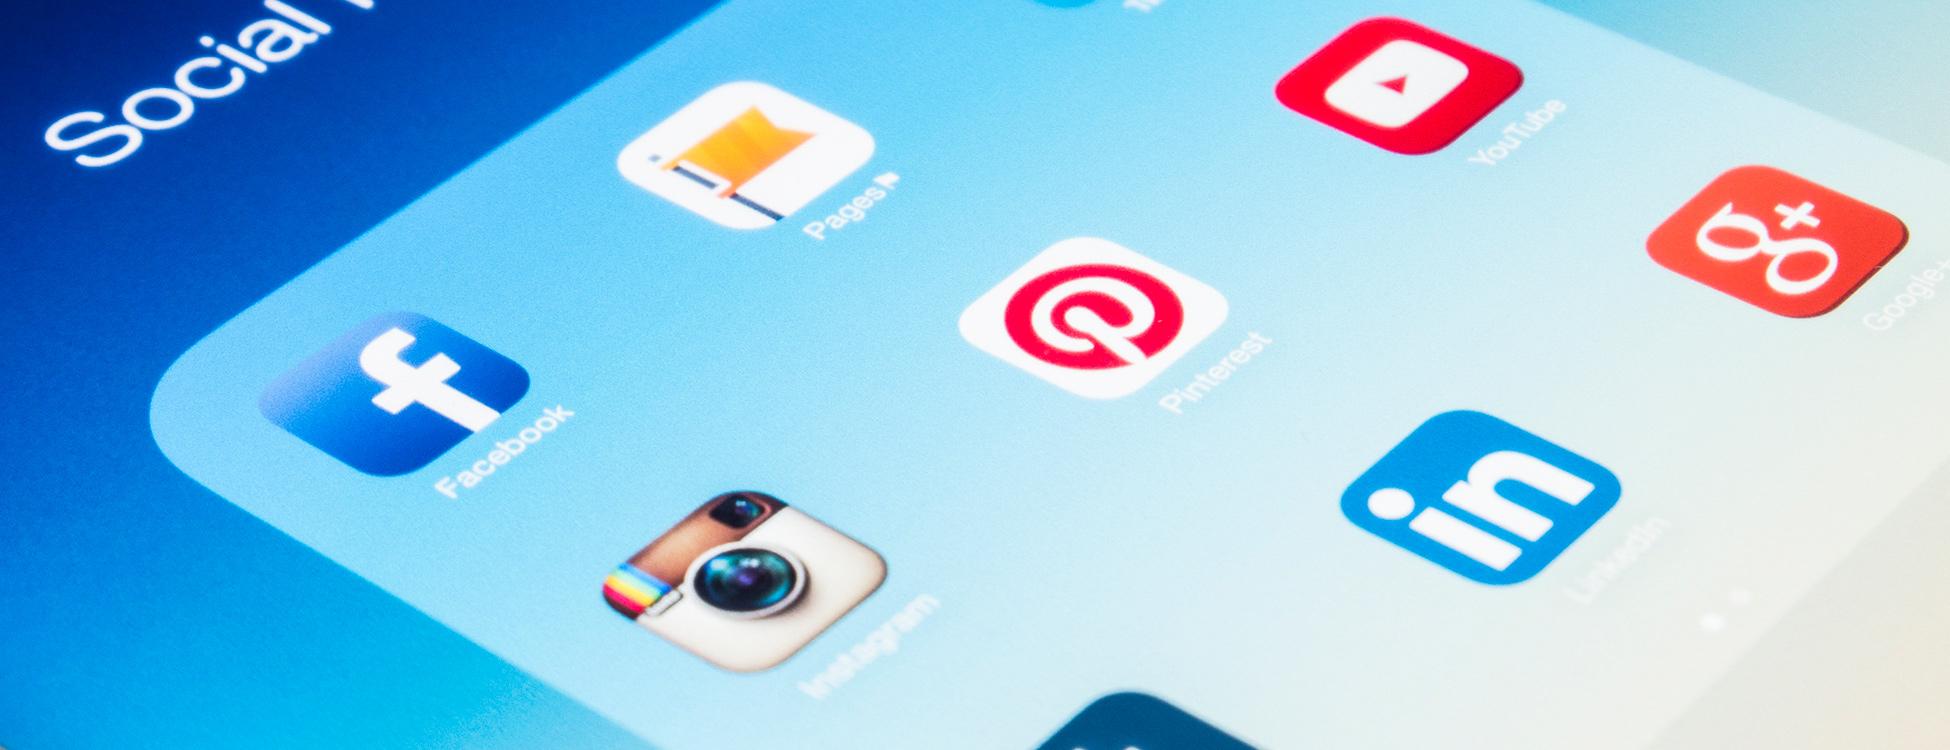 Social media marketing supports SEO services